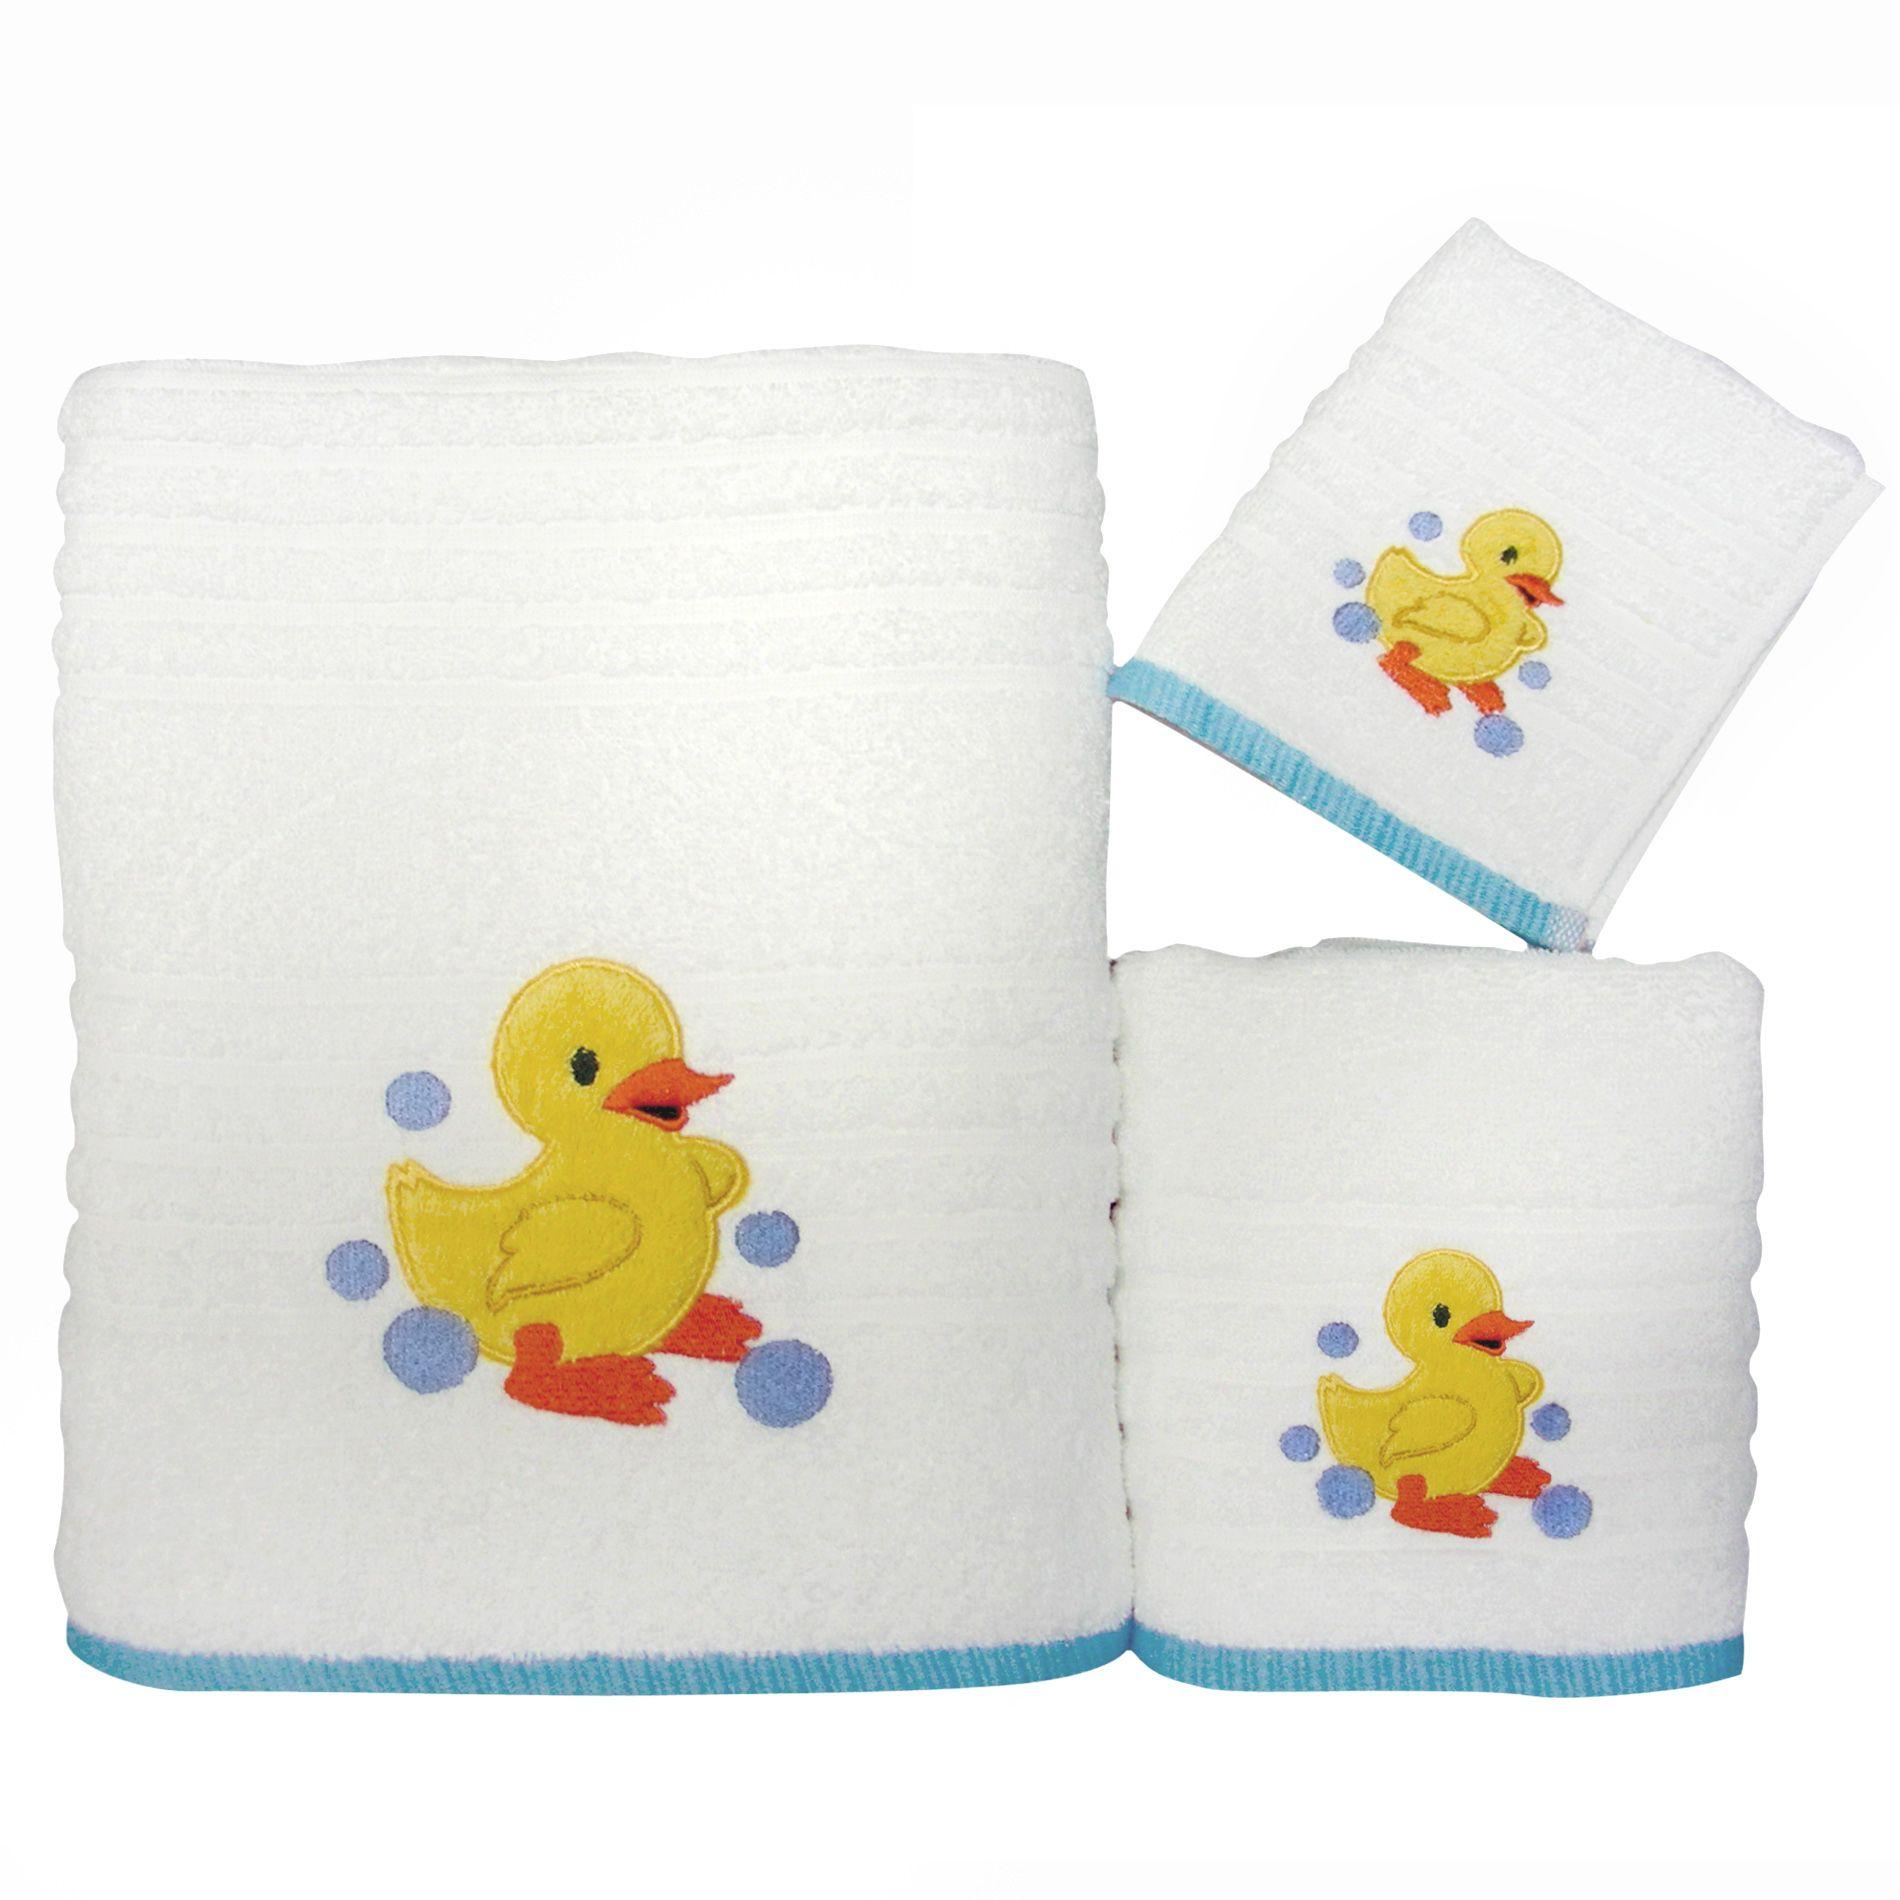 Colormate Rubber Duck Bath Towel